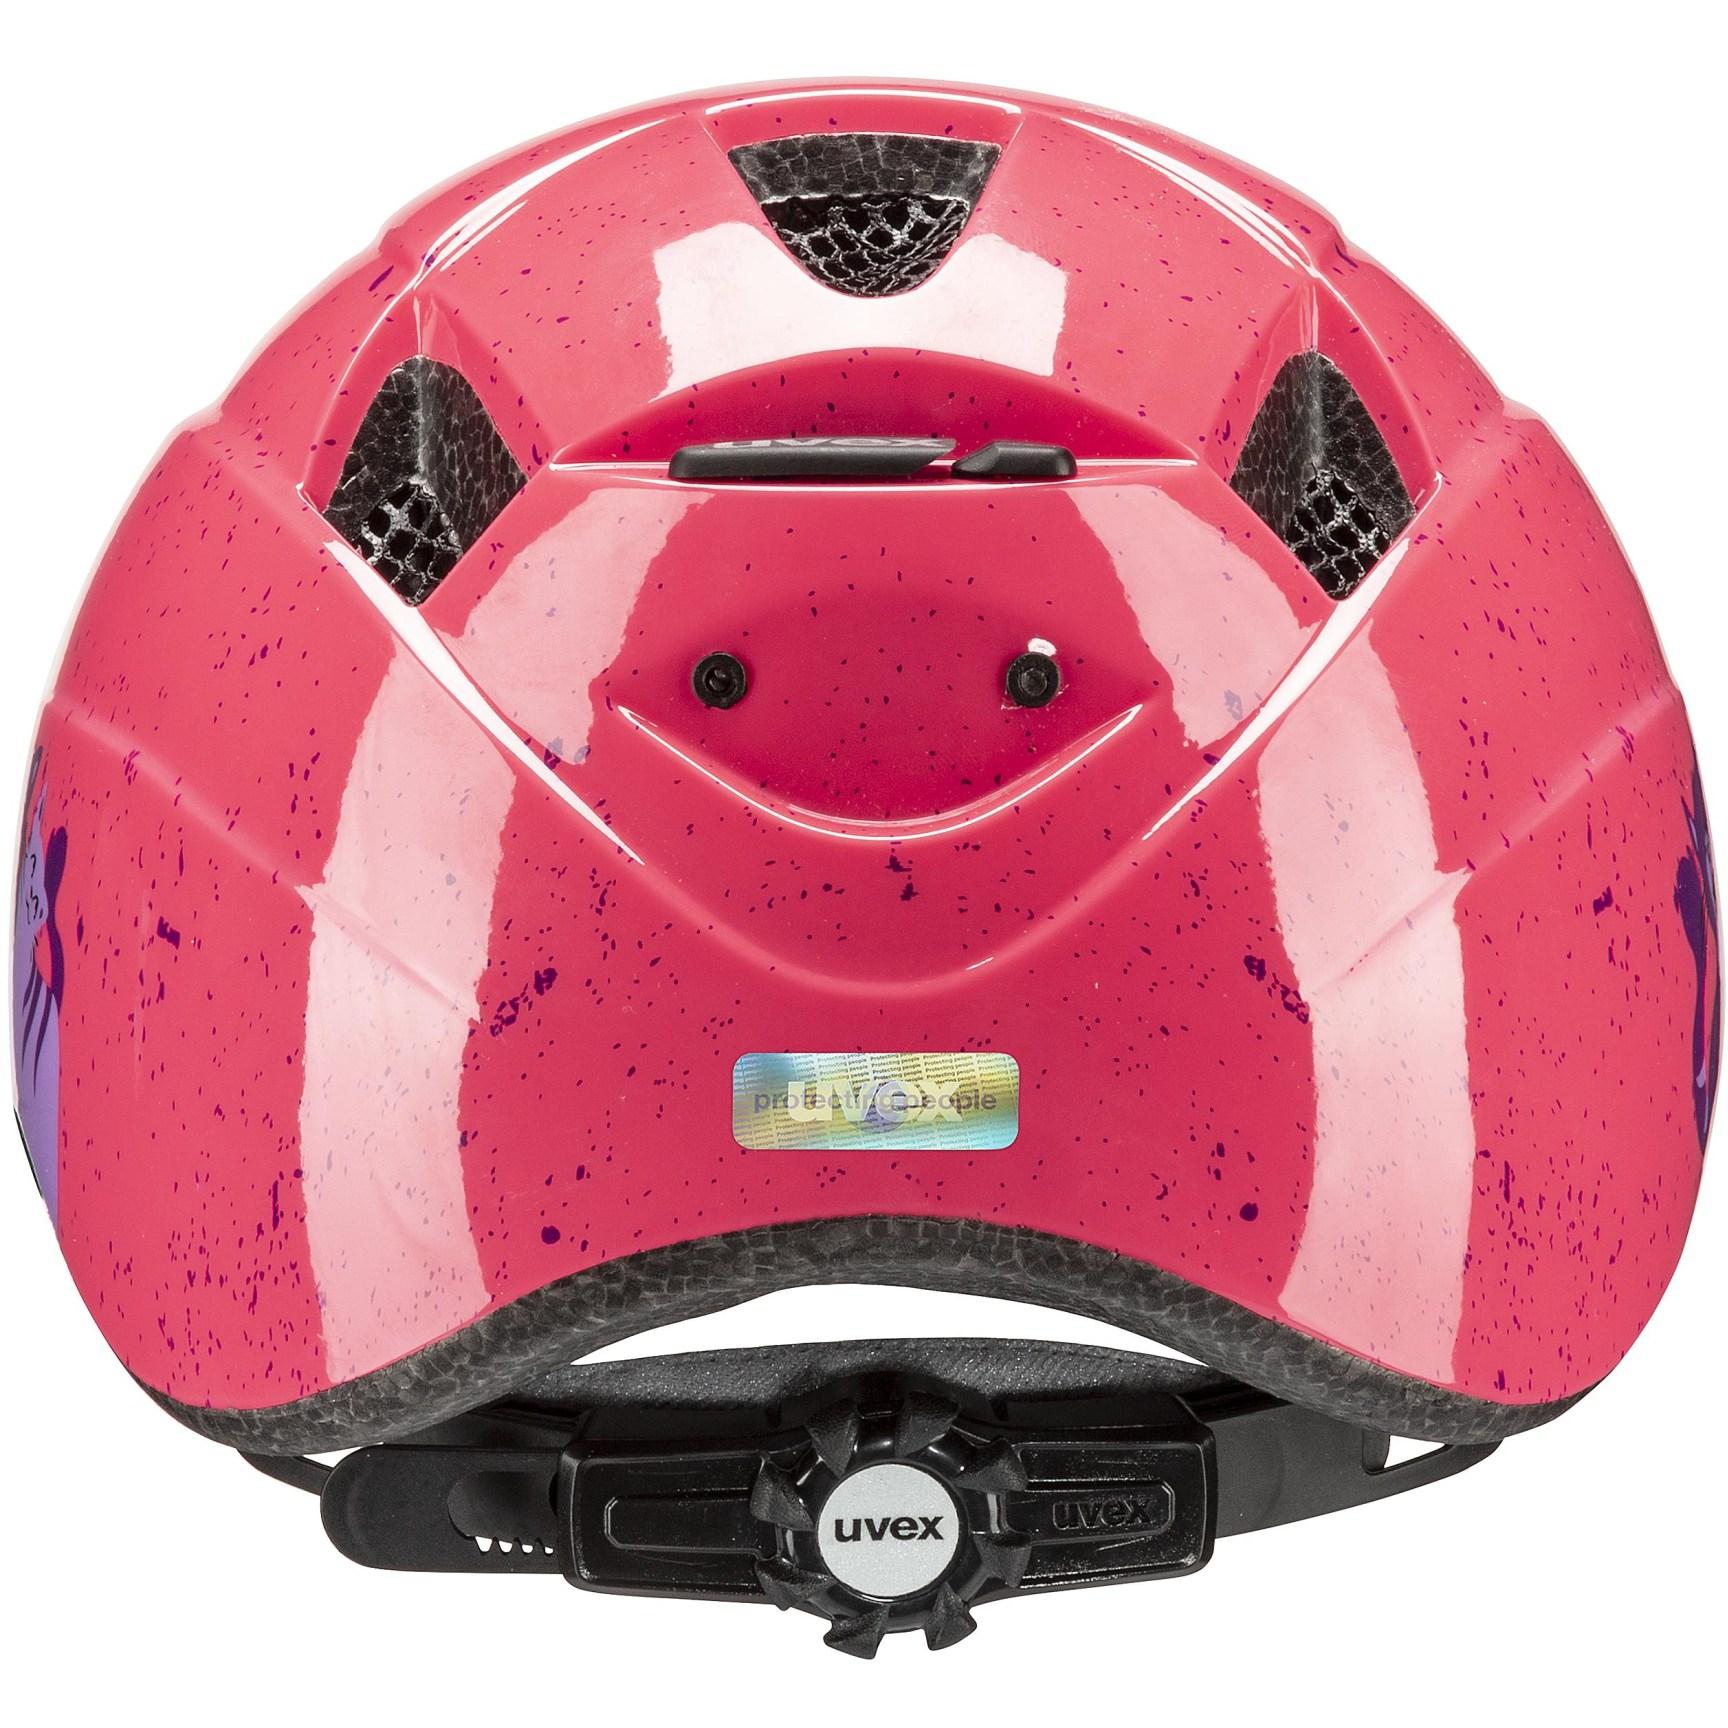 Image of Uvex kid 2 Kids Helmet - cats